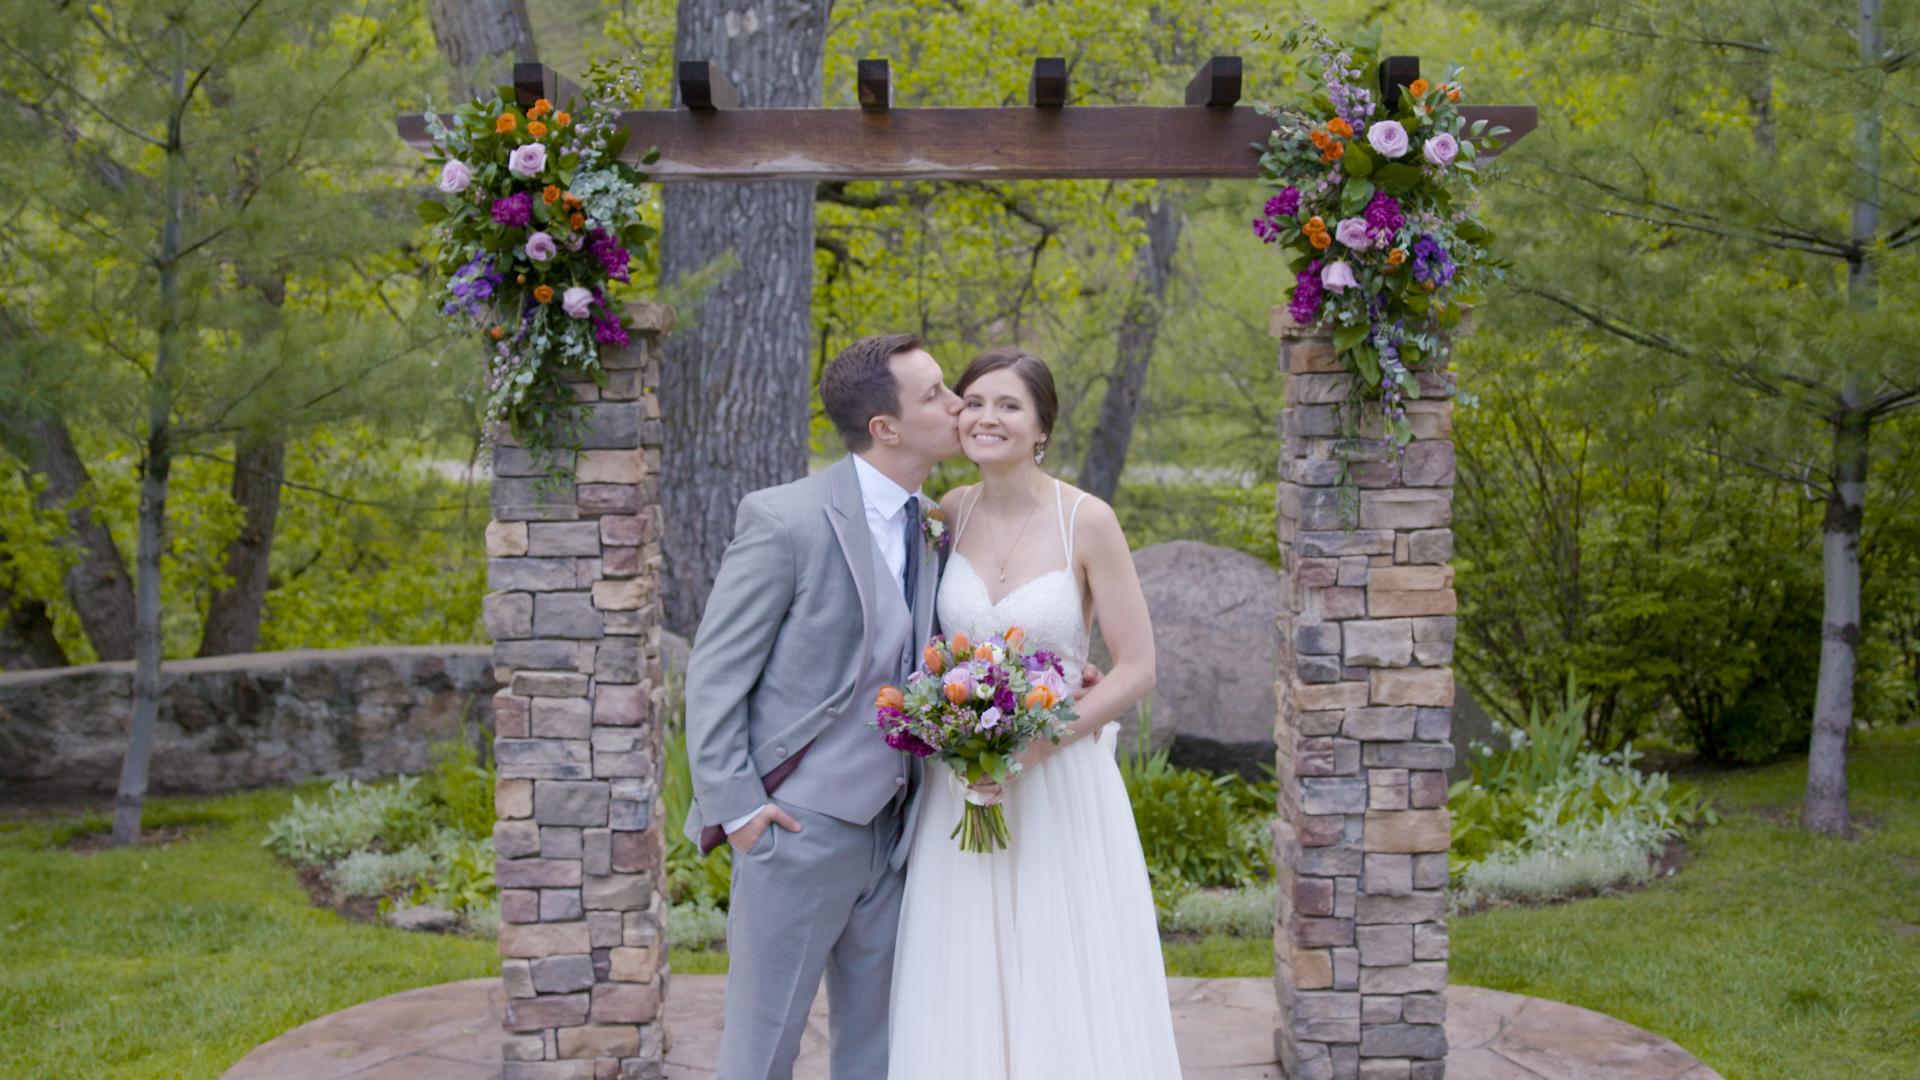 Whitney & Adam Ceremony Only Wedding